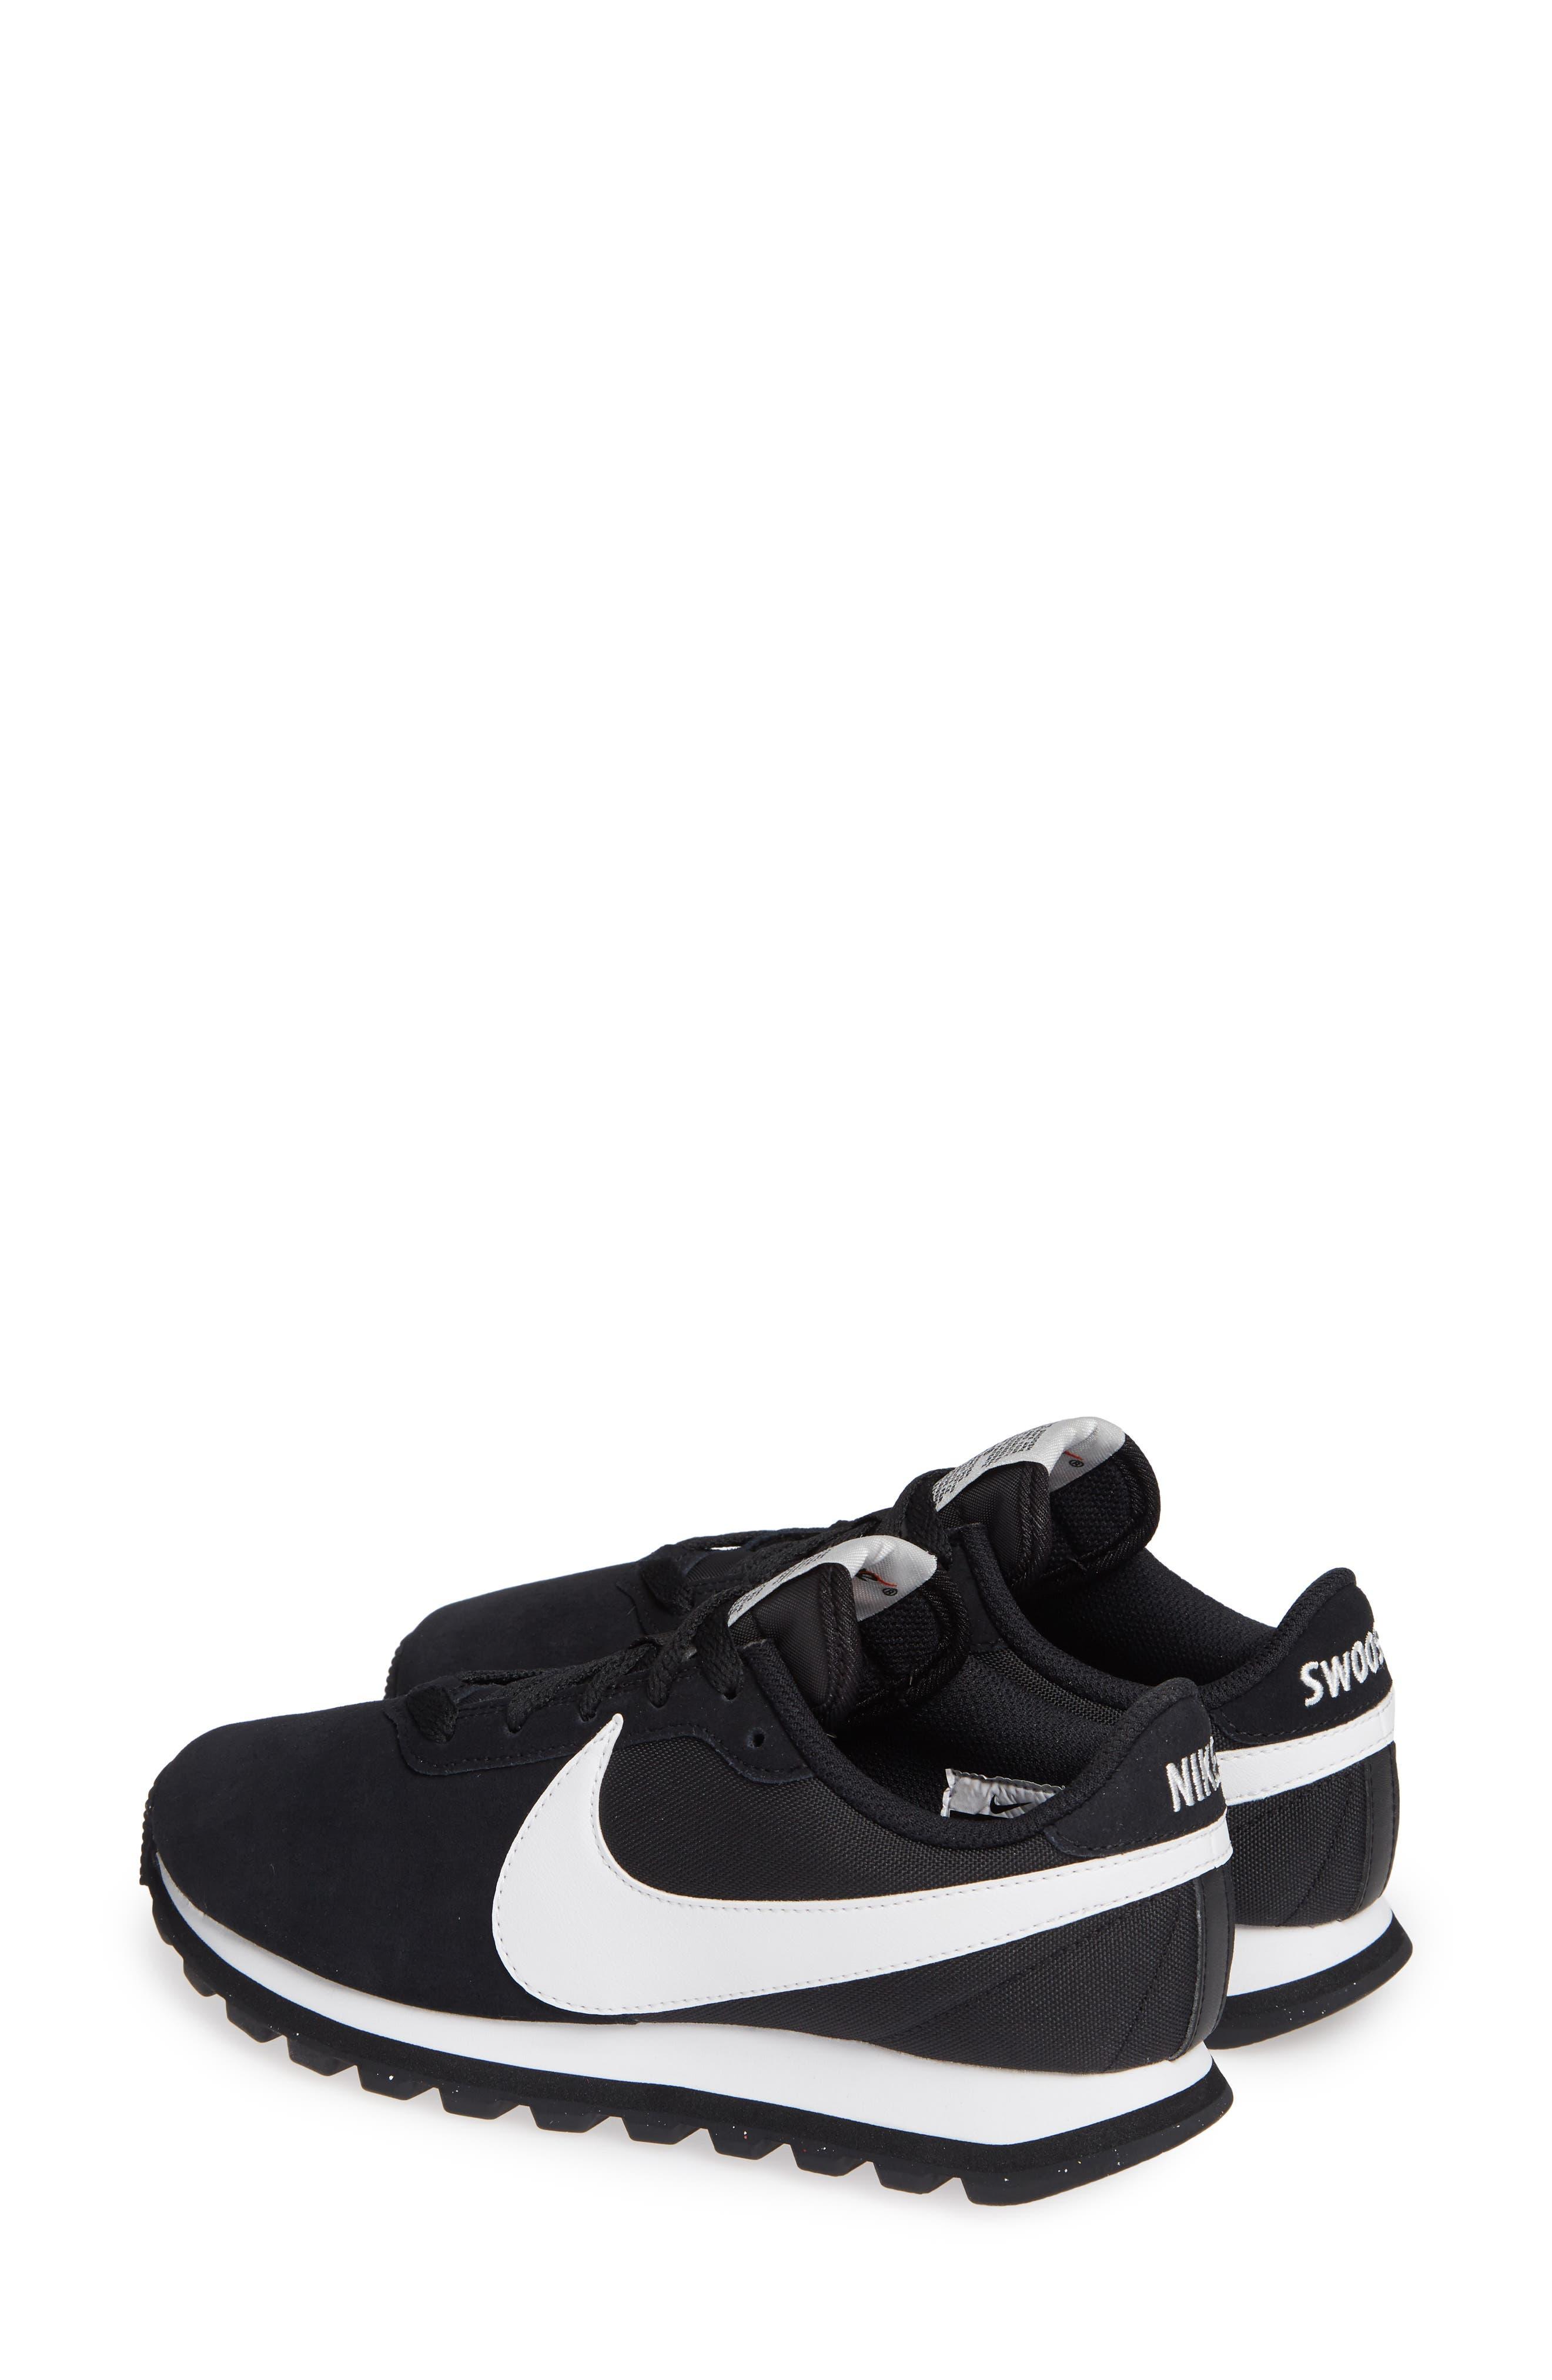 NIKE, Pre Love O.X. Sneaker, Alternate thumbnail 3, color, BLACK/ SUMMIT WHITE